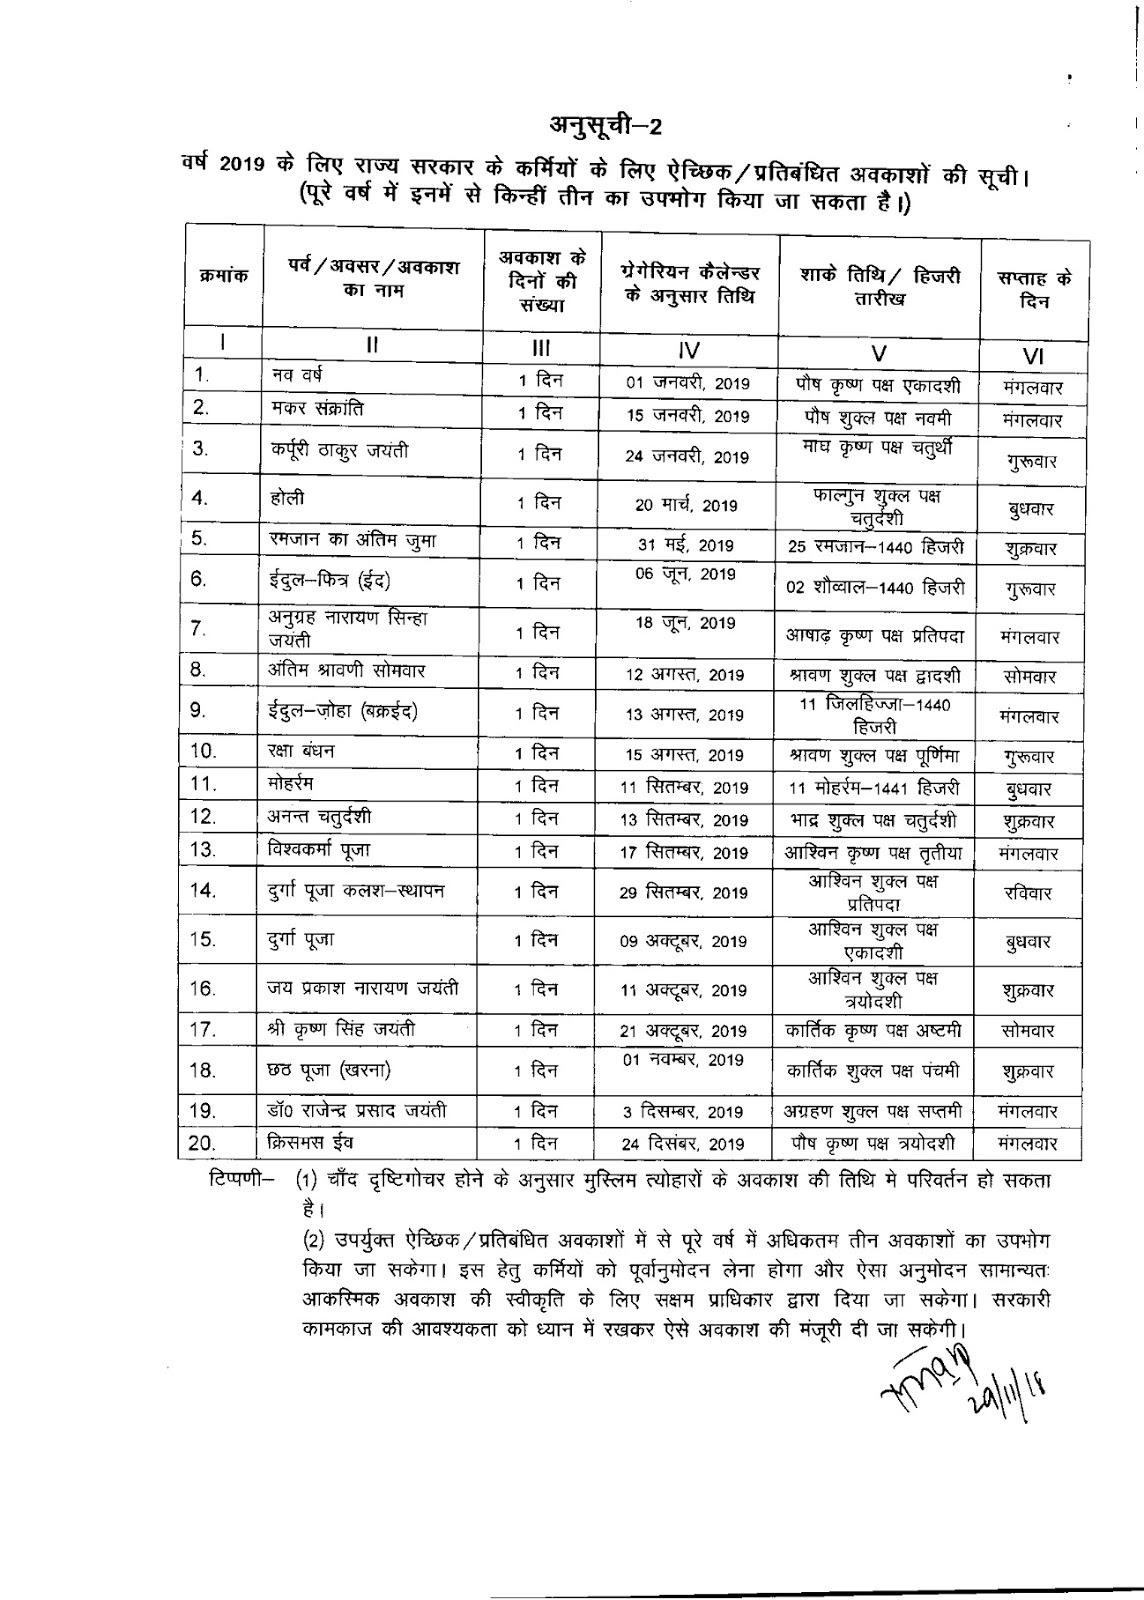 Bihar Government Calendar 2019 #Educratsweb with Bihar Govt Calendar 2018